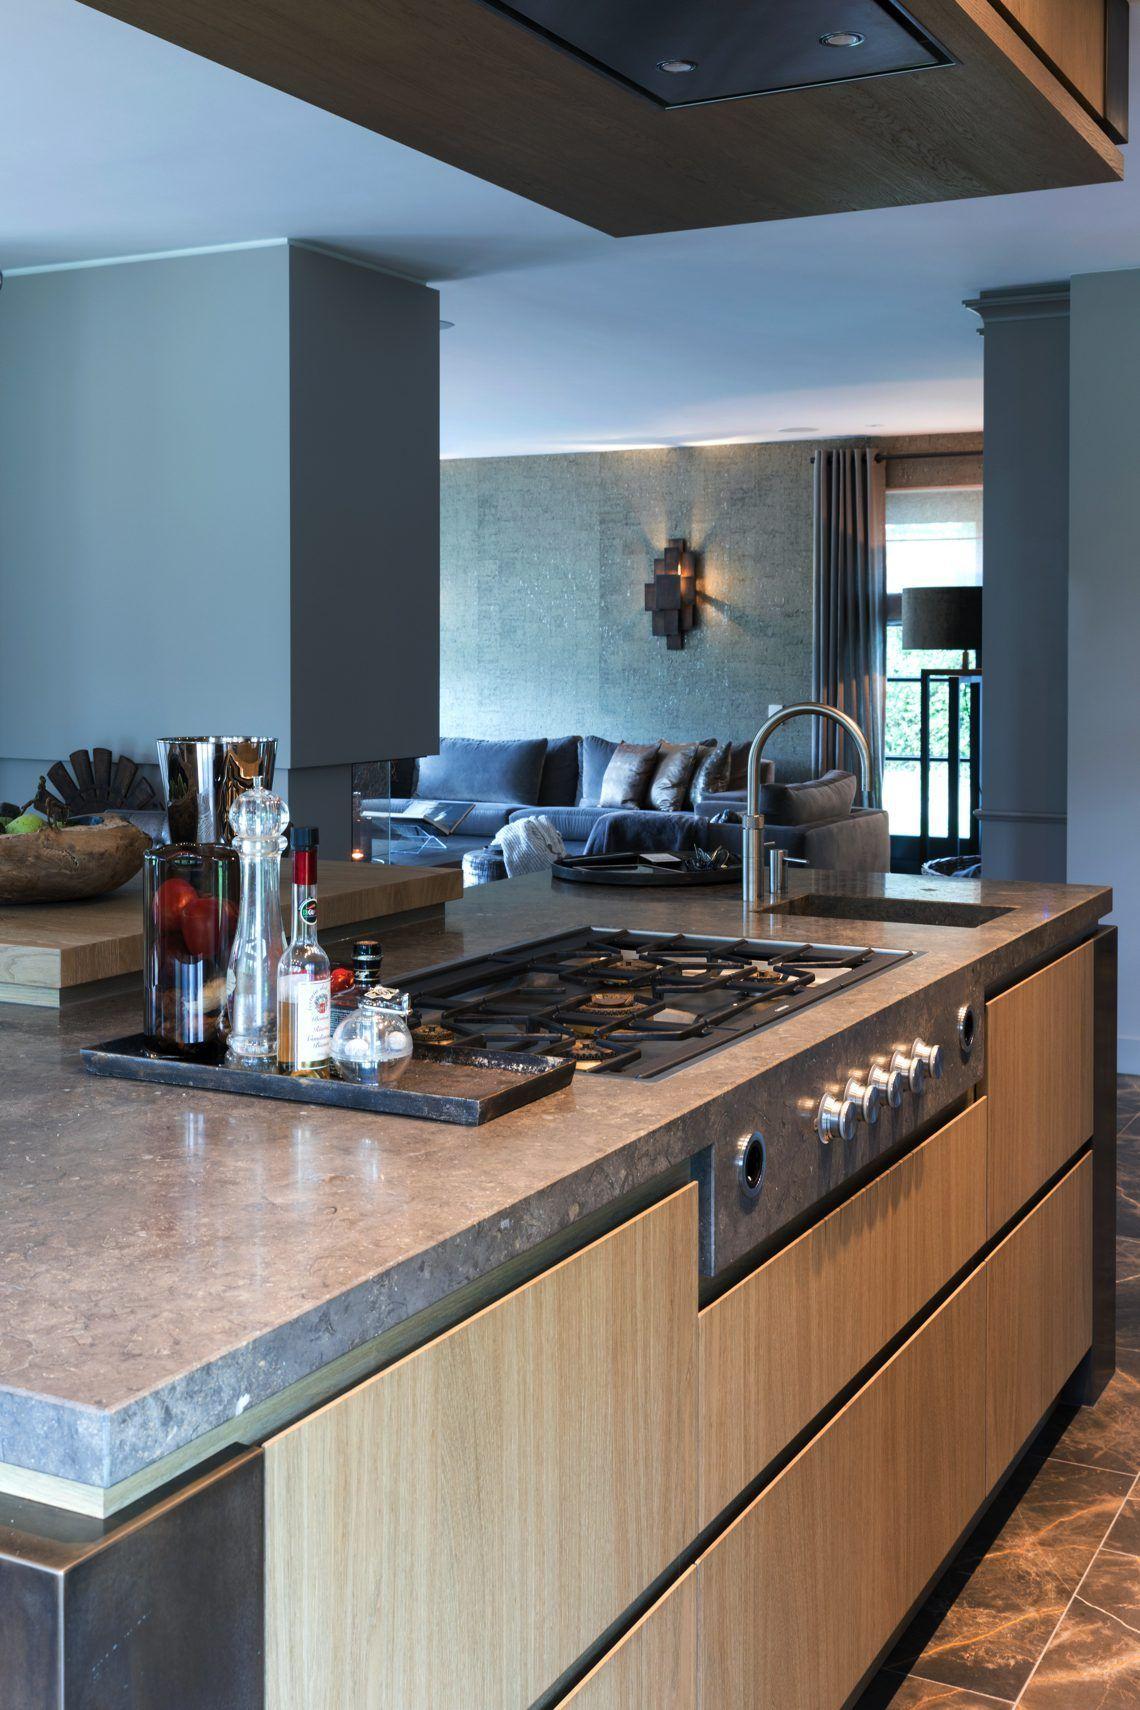 Top 50+ Kitchen Island Ideas and Design in 2018 | Kitchen wood ...